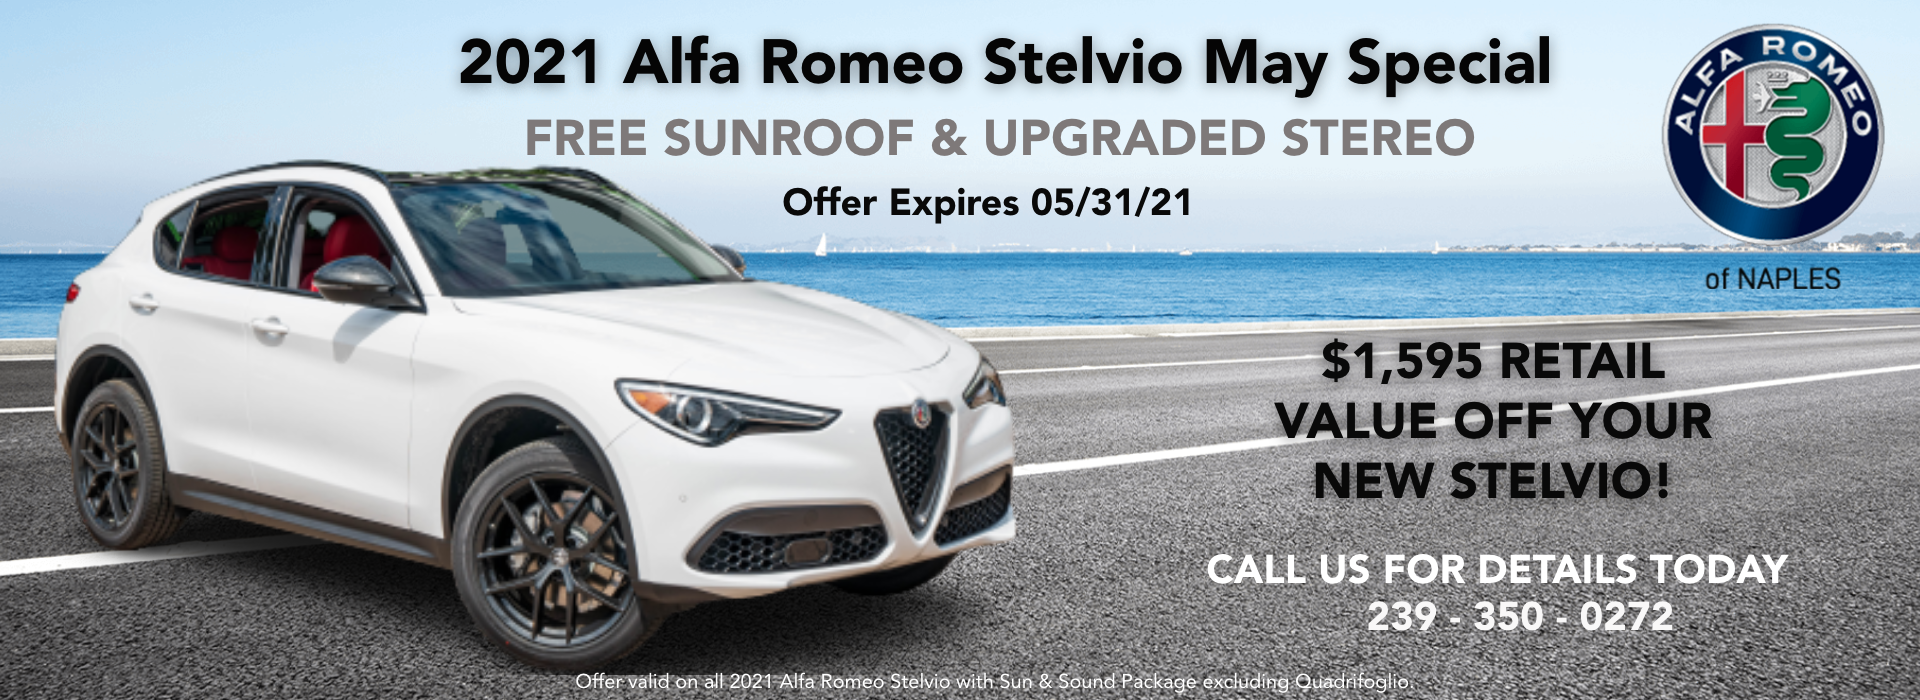 2021_Alfa Romeo_Stelvio_Quadrifoglio_Mon May 10 2021 10_20_24 GMT-0400 (Eastern Daylight Time)